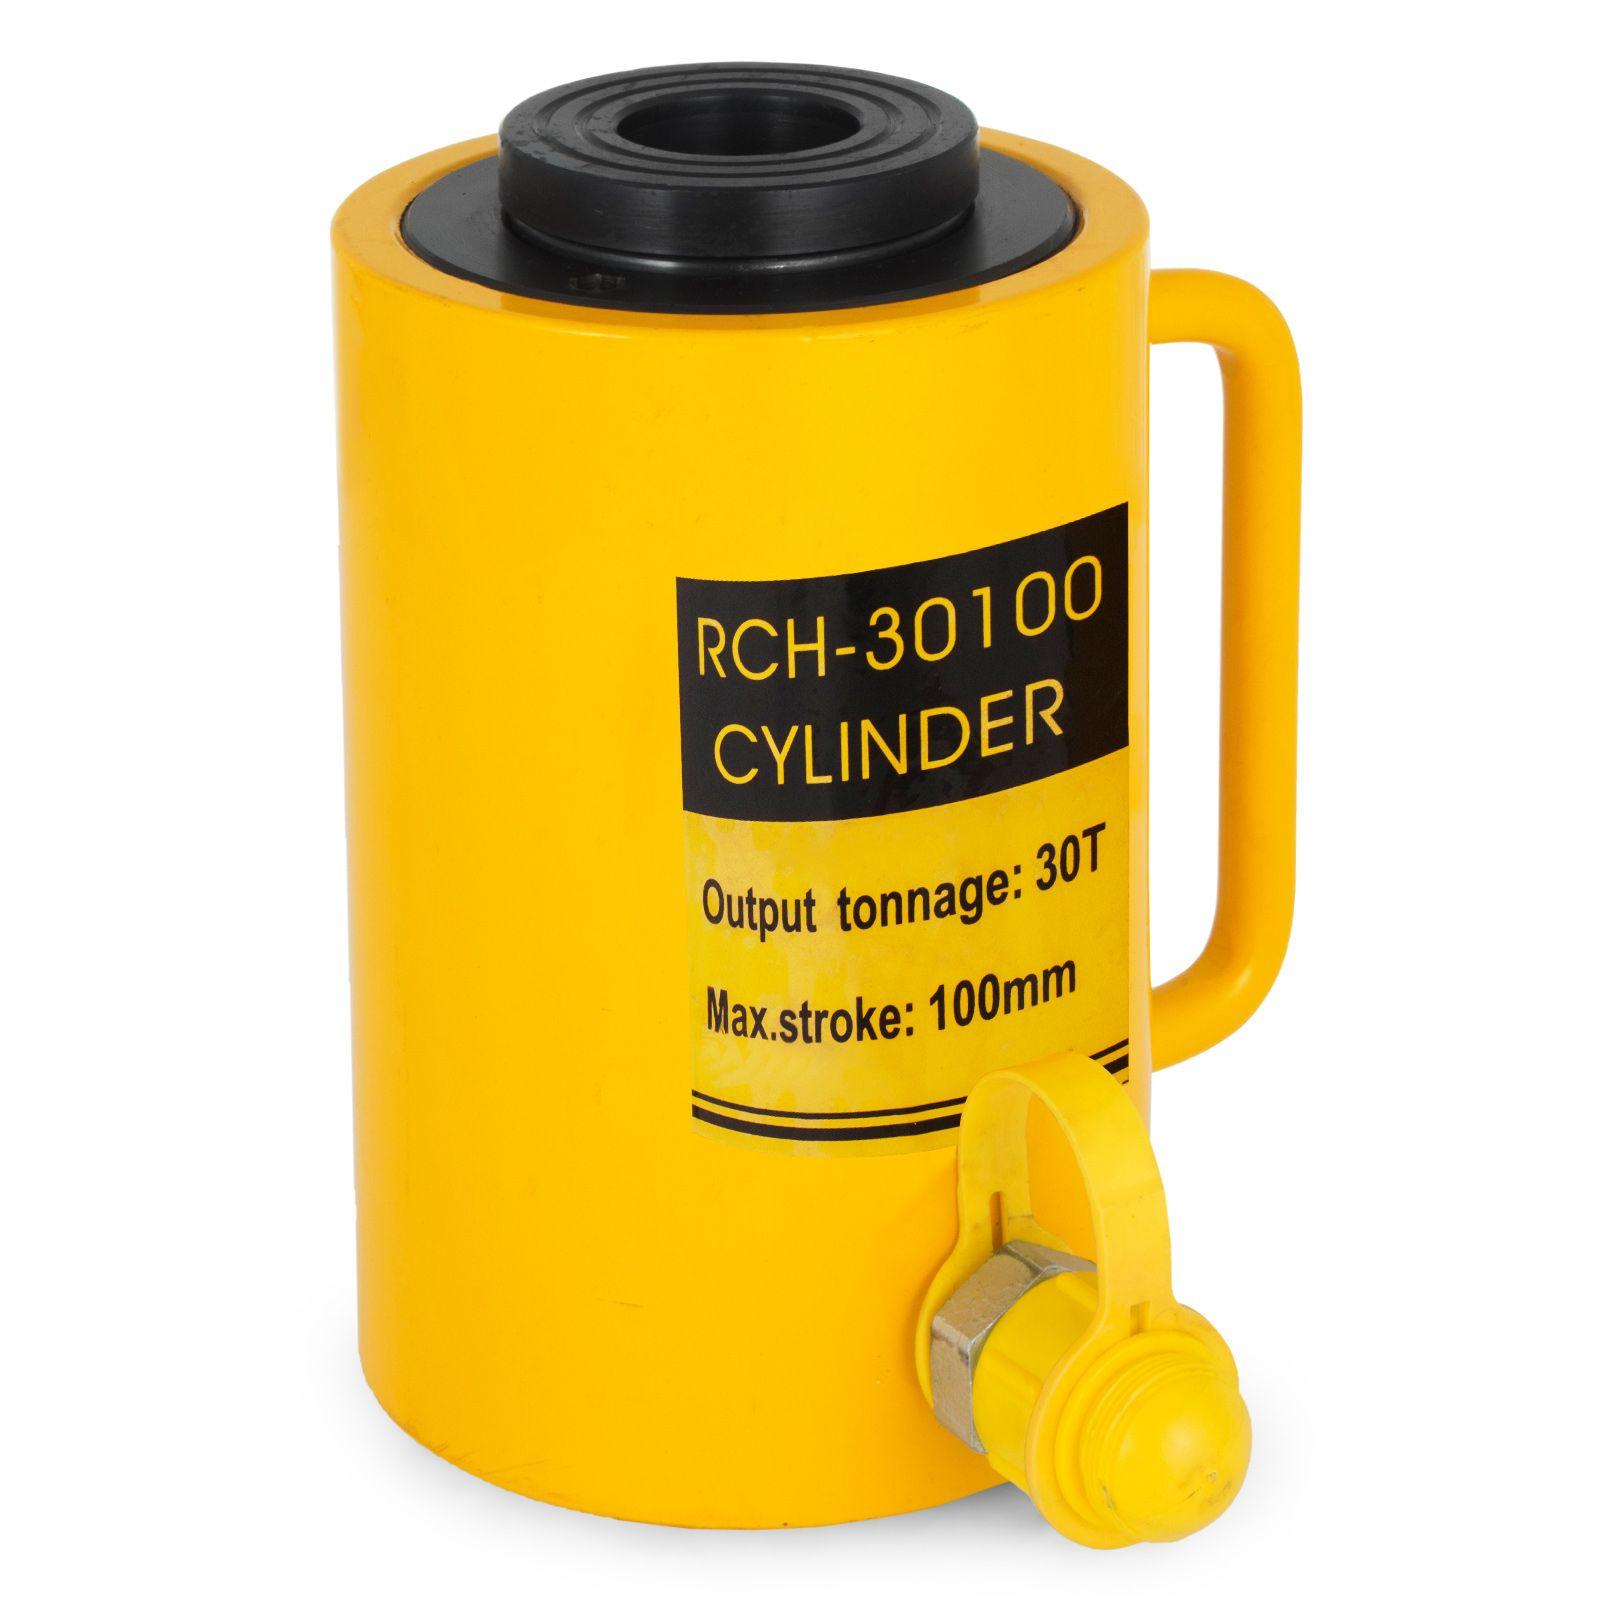 Pin on Hydraulics, Pneumatics and Pumps